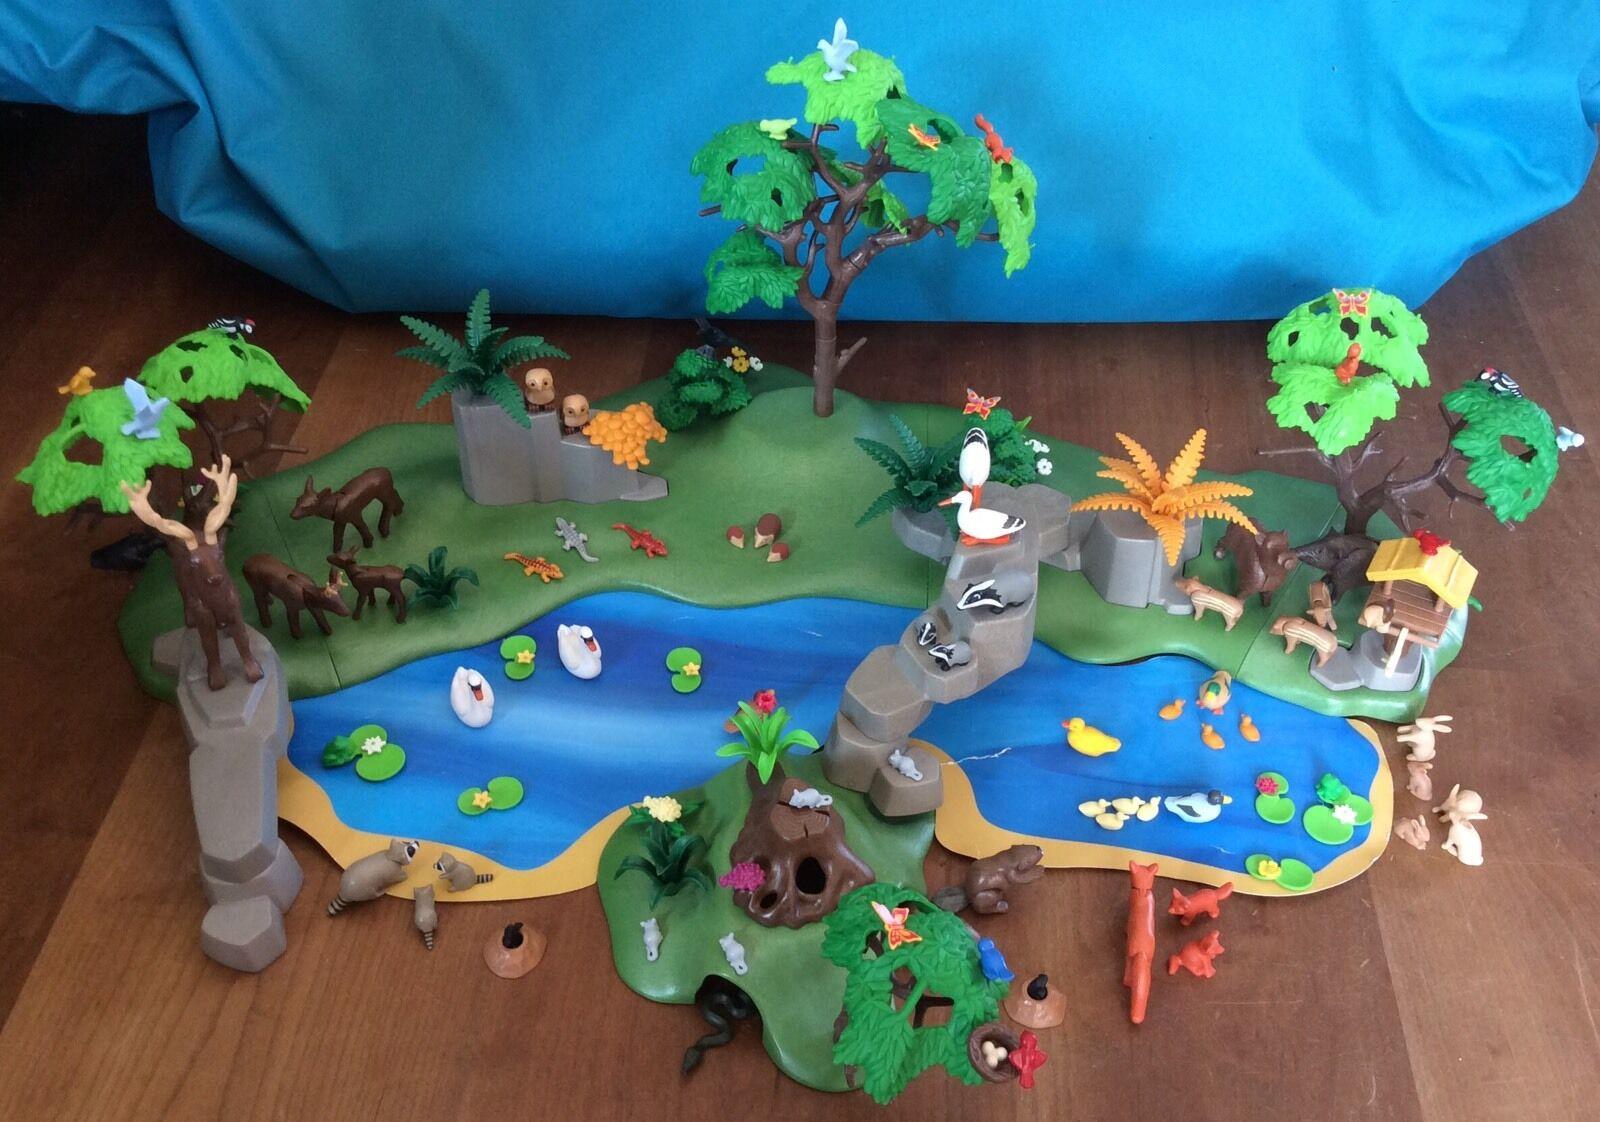 4095 Playmobil Großes Tierparadies Tiere Paradies Biber Wasserstelle Schwan Eule